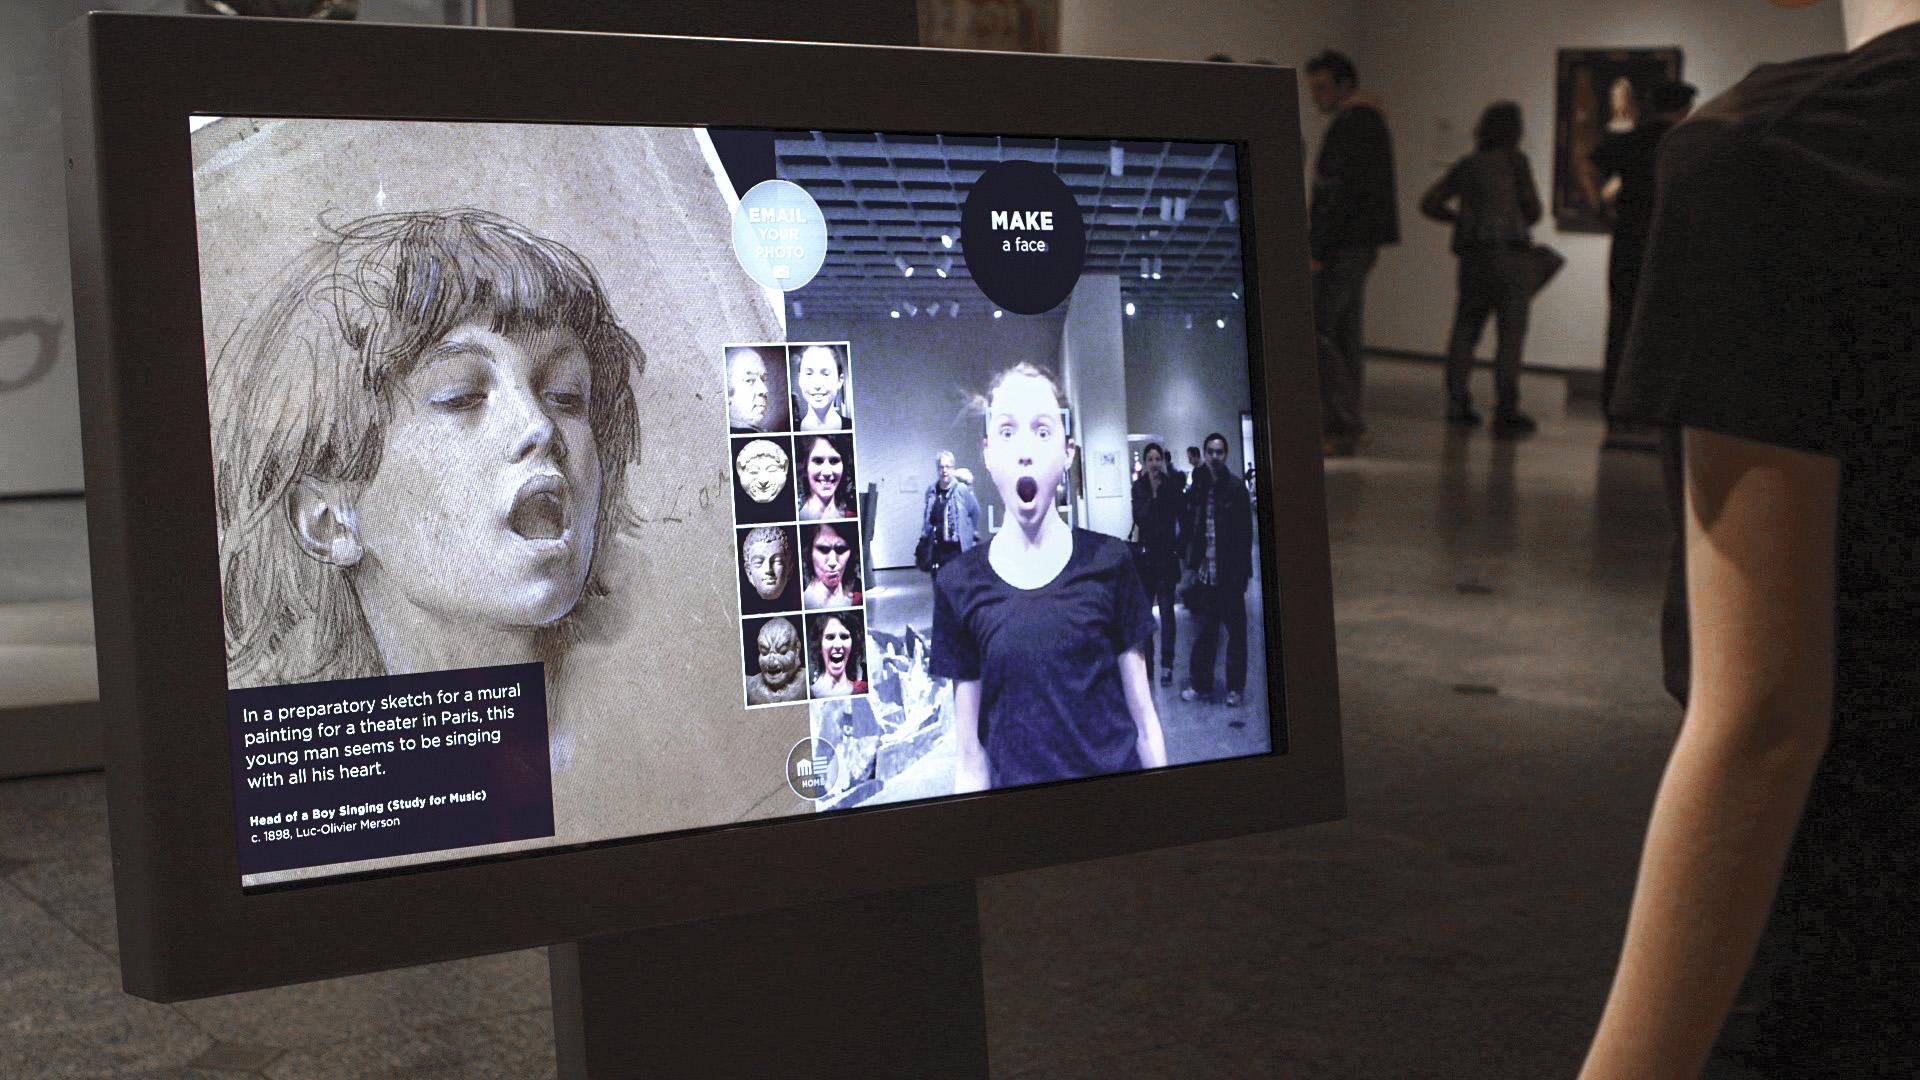 https://i0.wp.com/mw2013.museumsandtheweb.com/wp-content/uploads/2013/02/LP-CMA-FaceArtwork-Child-02.jpg